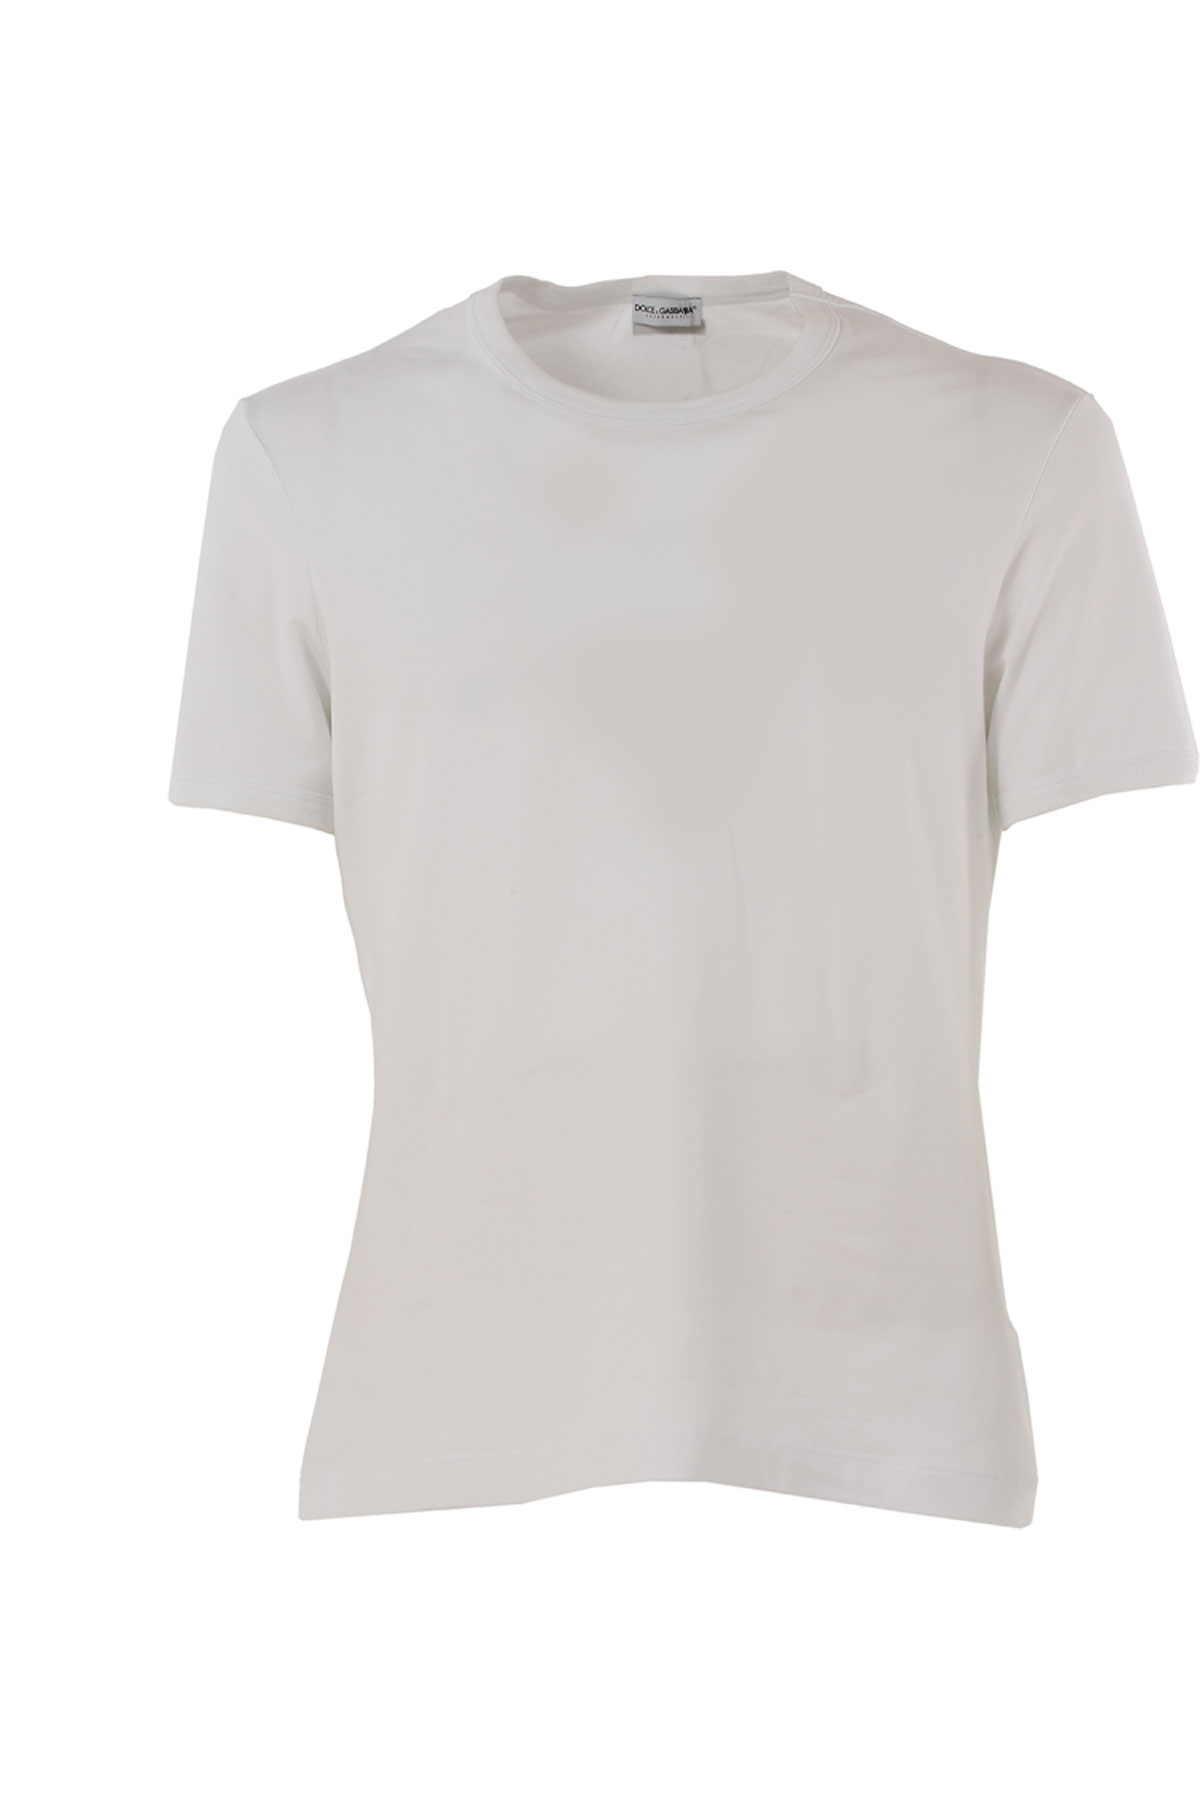 ca3dd33093ce1d Mens Clothing Dolce   Gabbana